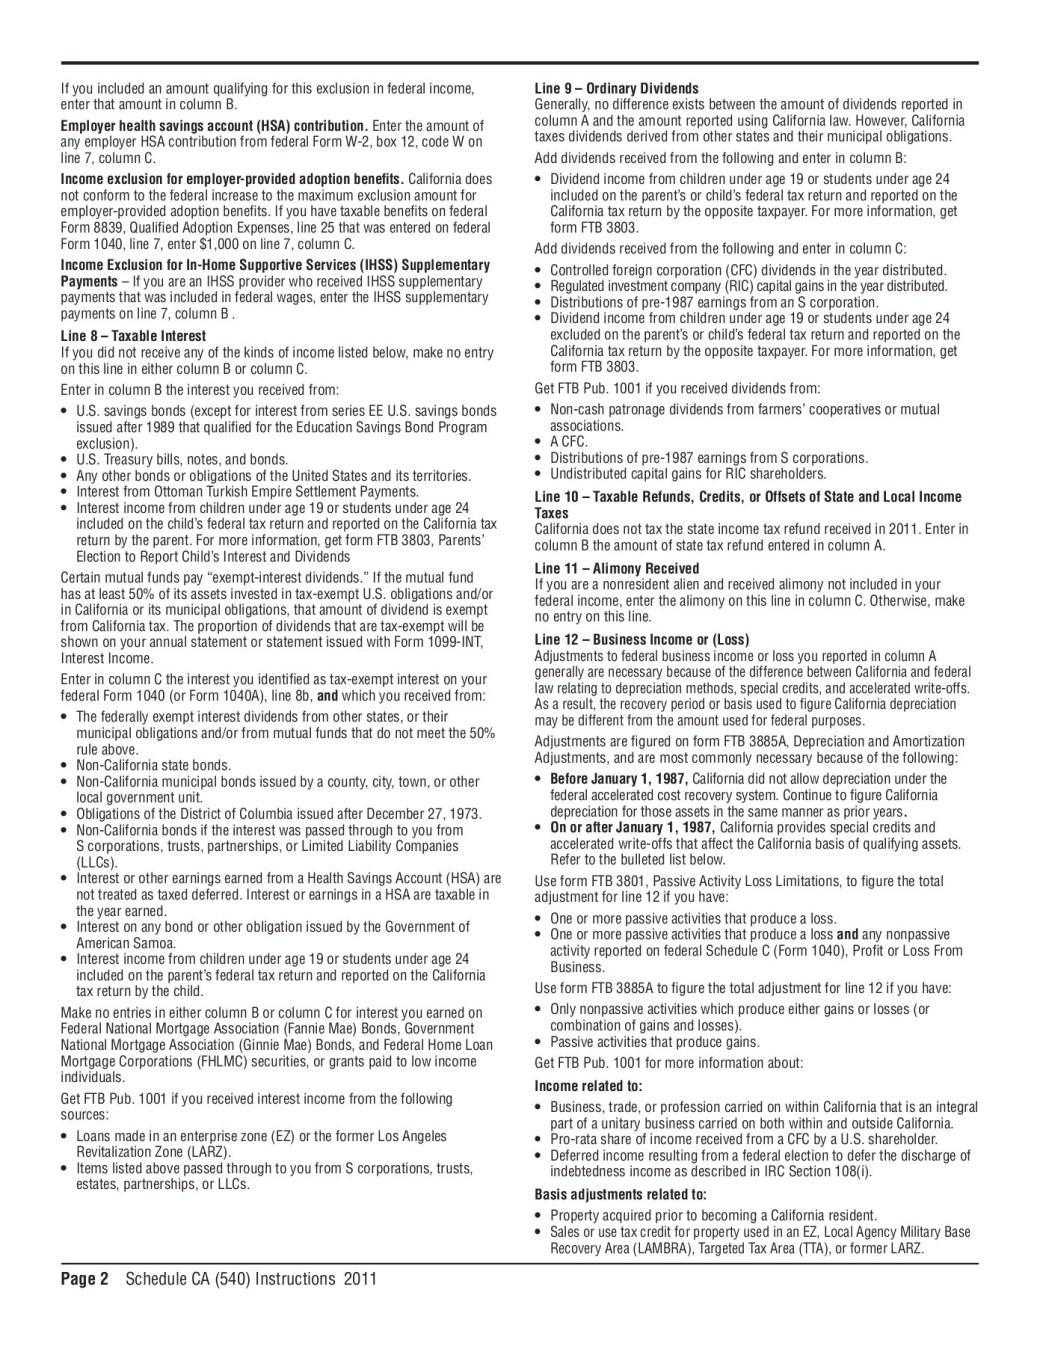 California Tax Table 540 2ez   Review Home Decor